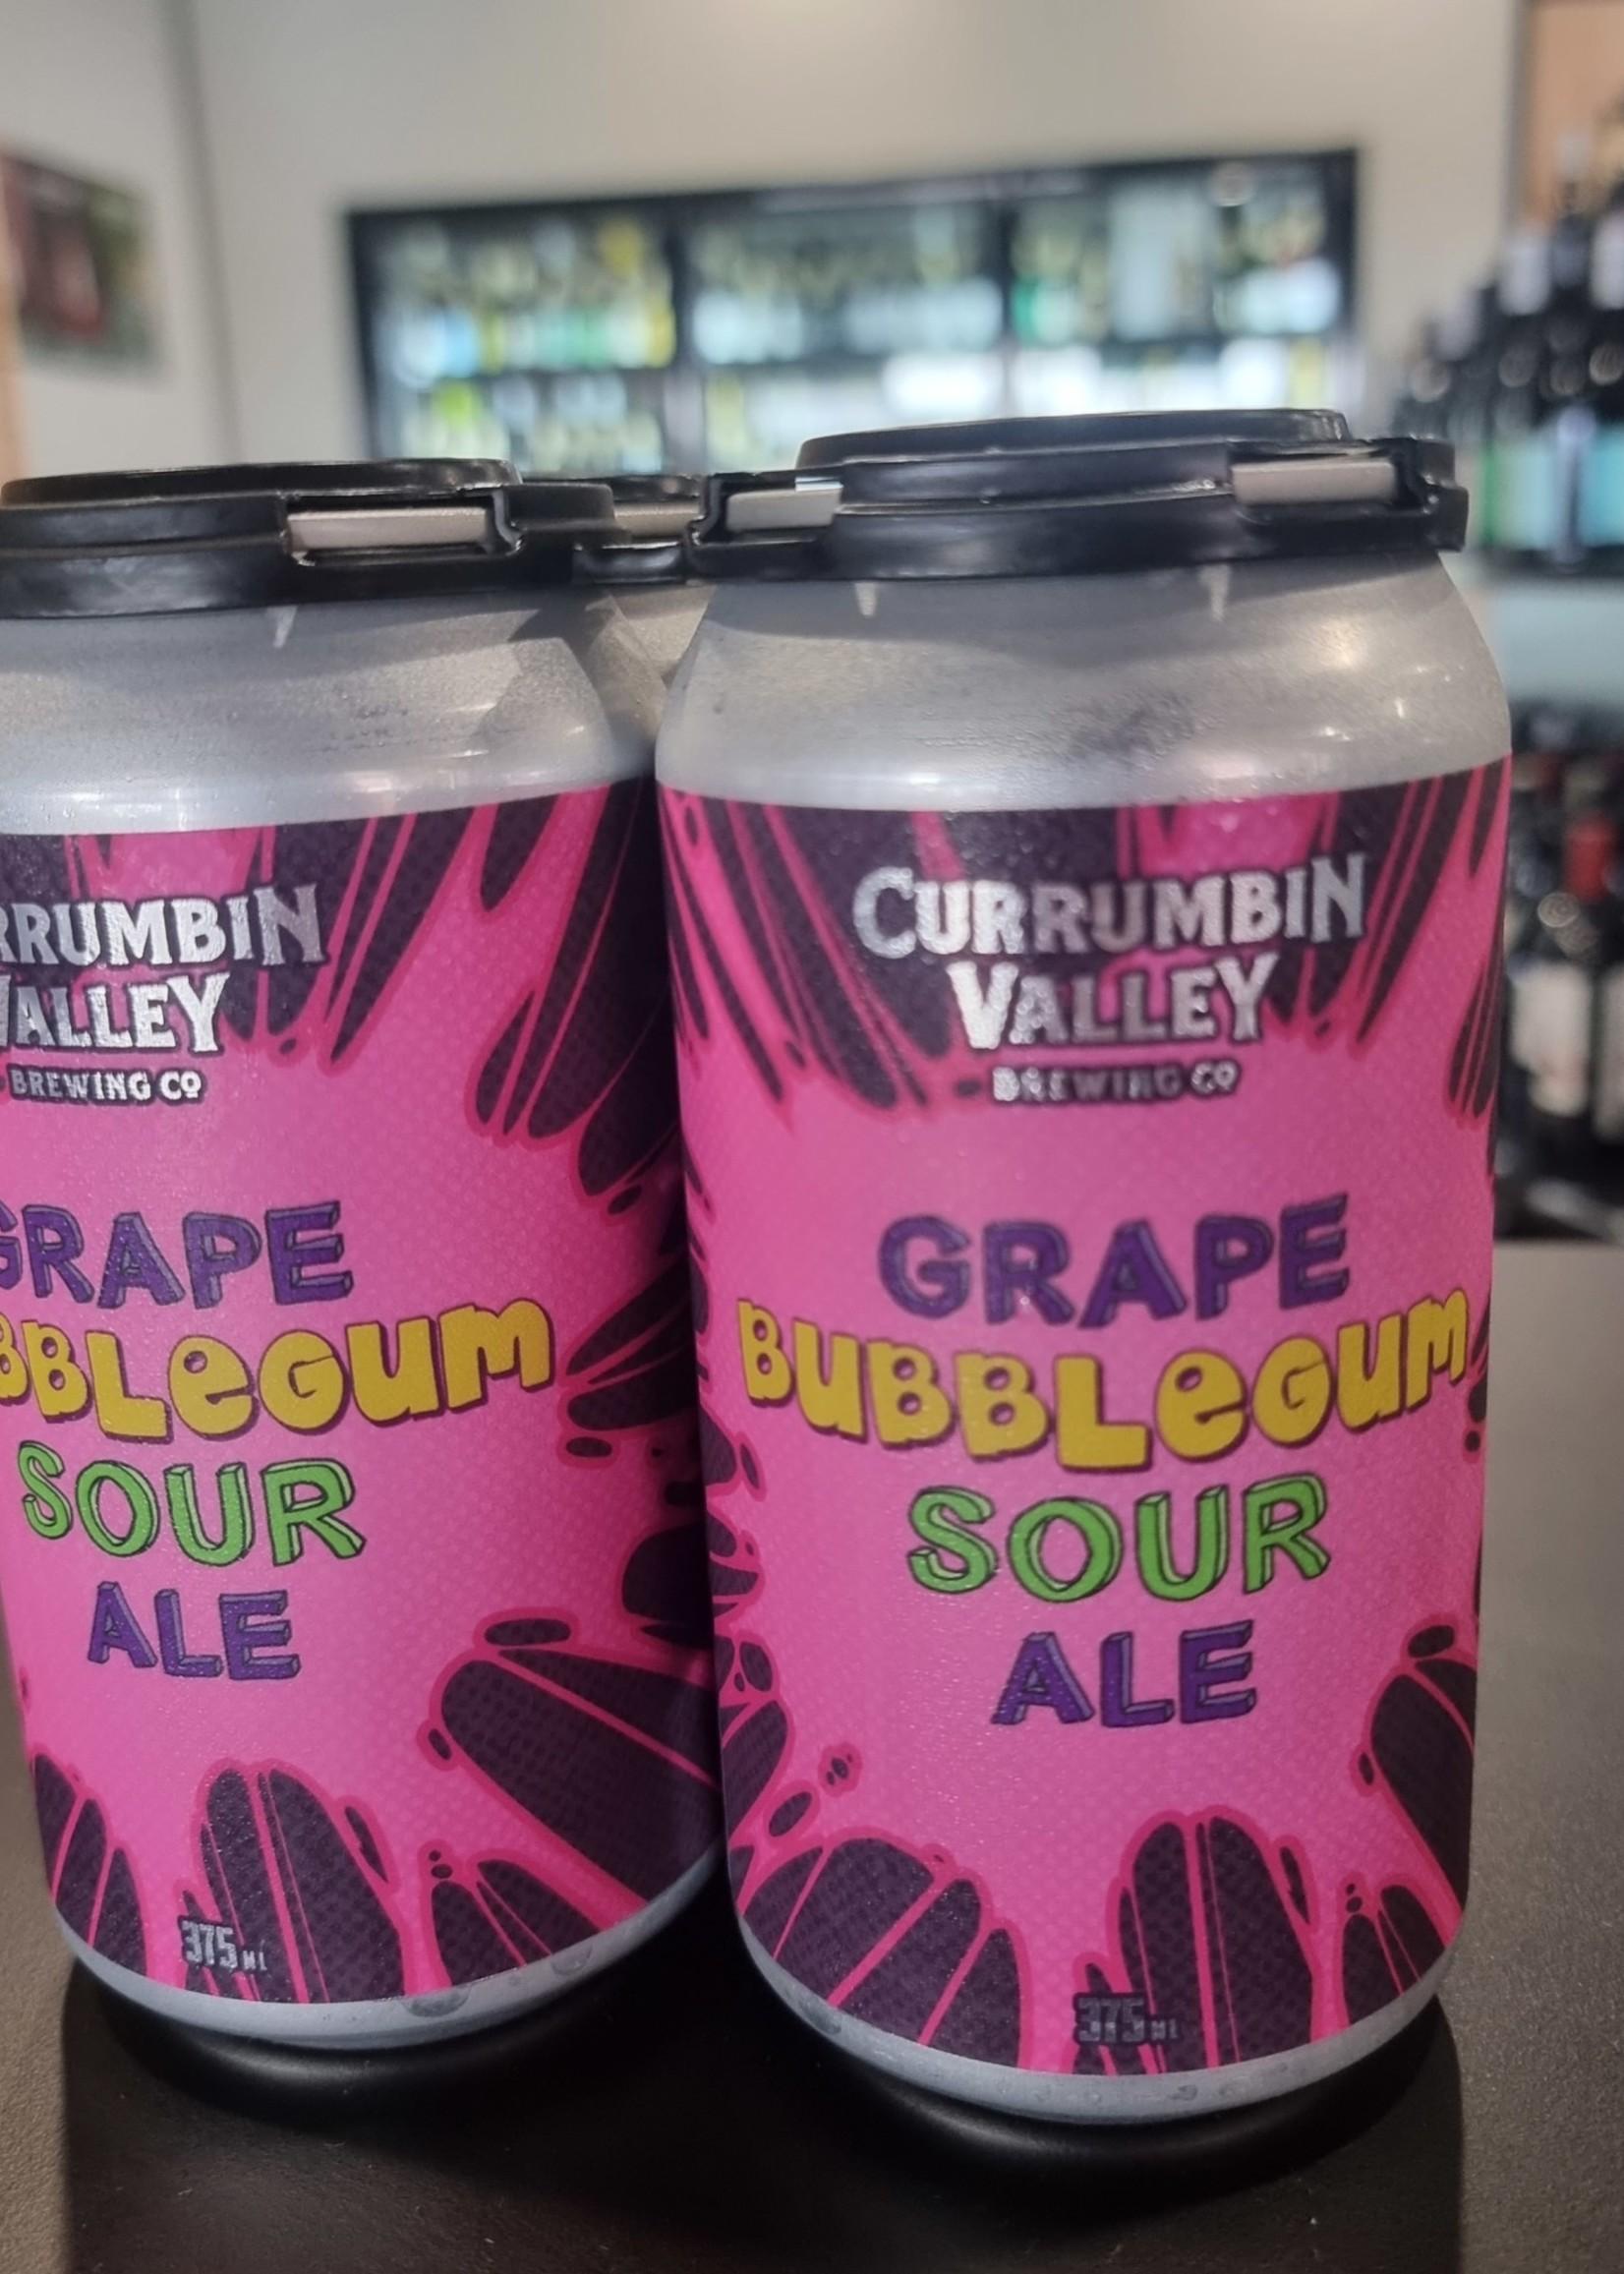 Currumbin Valley Currumbin Valley 'Grape Bubblegum' Sour Ale 5.2% 4 Pack